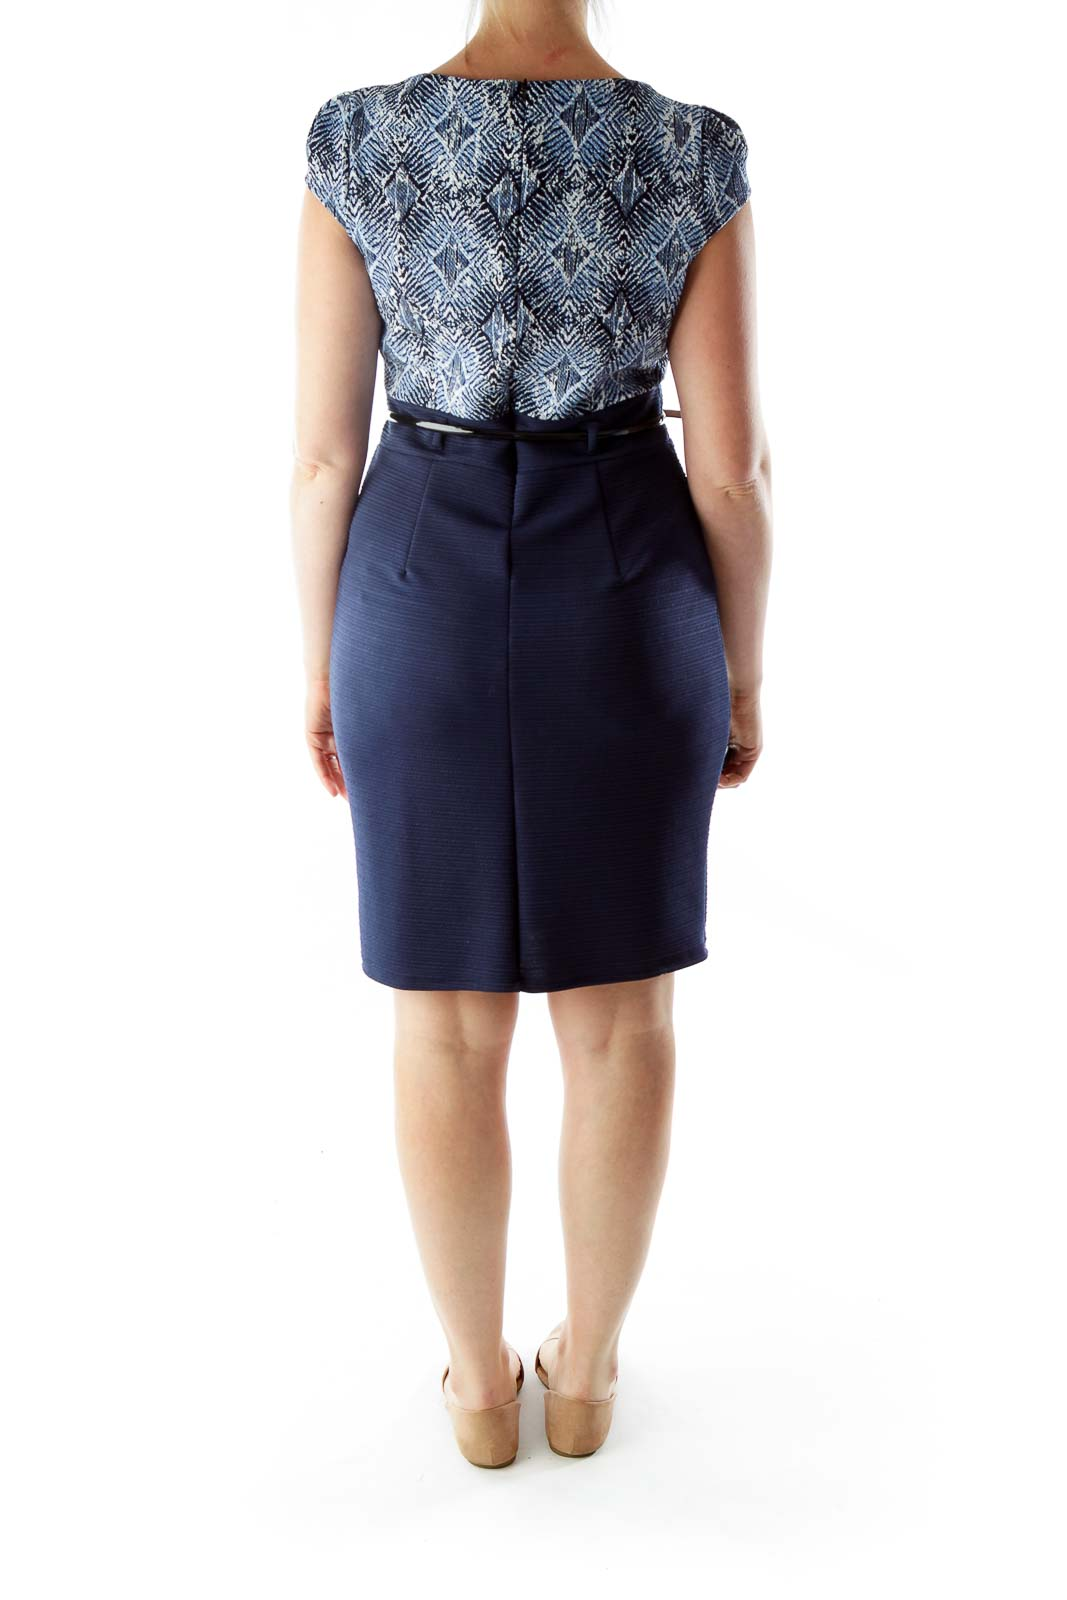 Blue Navy White Geometric Print Work Dress